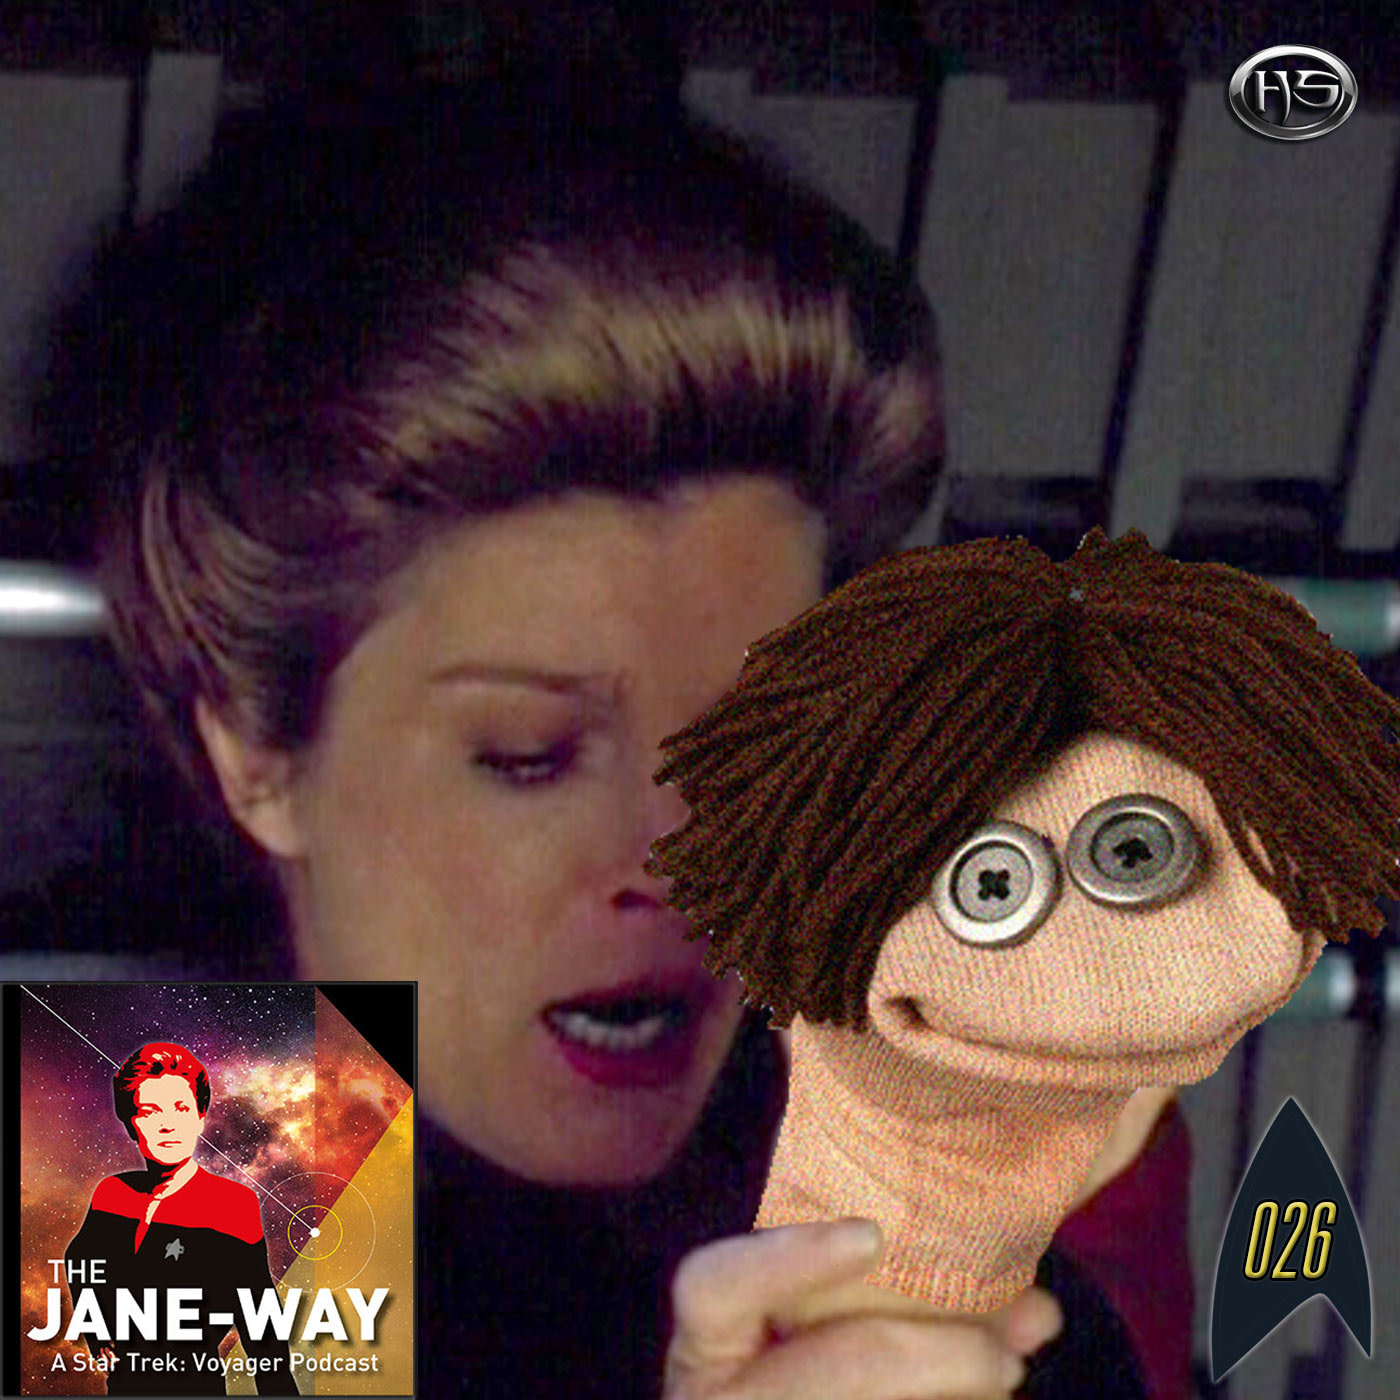 The Jane-Way Episode 26